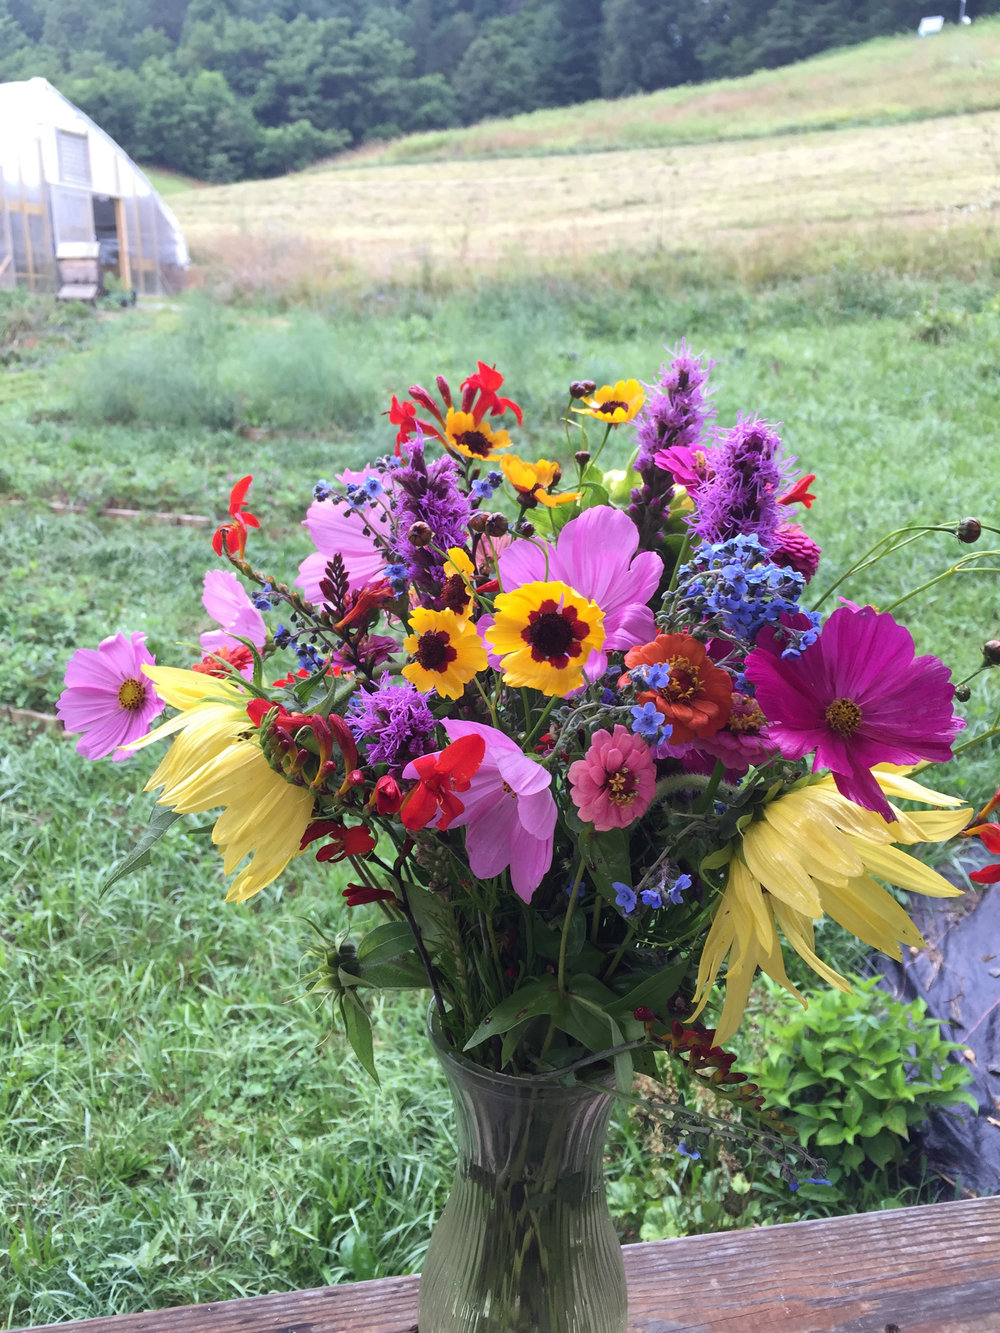 Flowers grown on Indigo Bunting Farm.